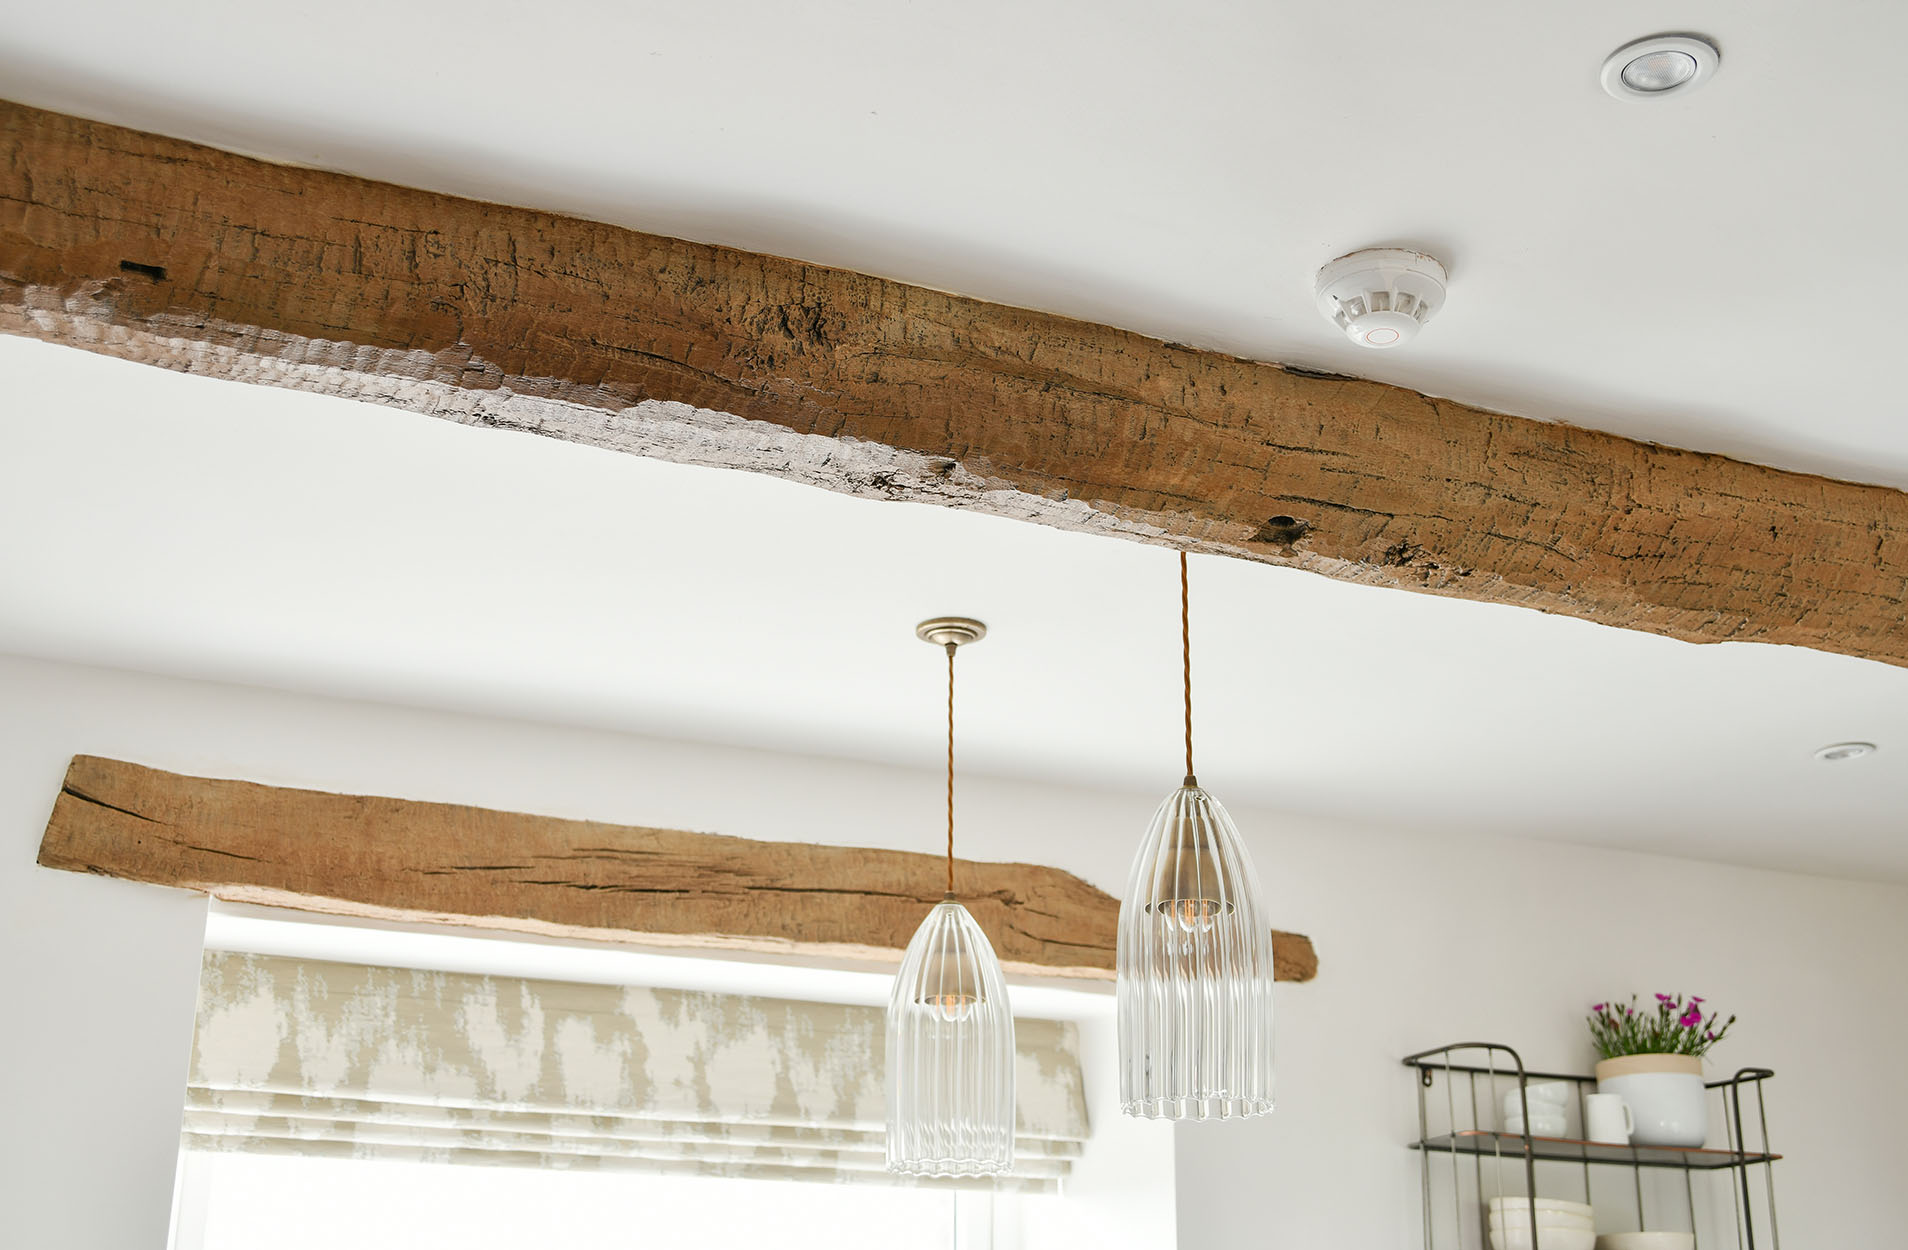 treated beams